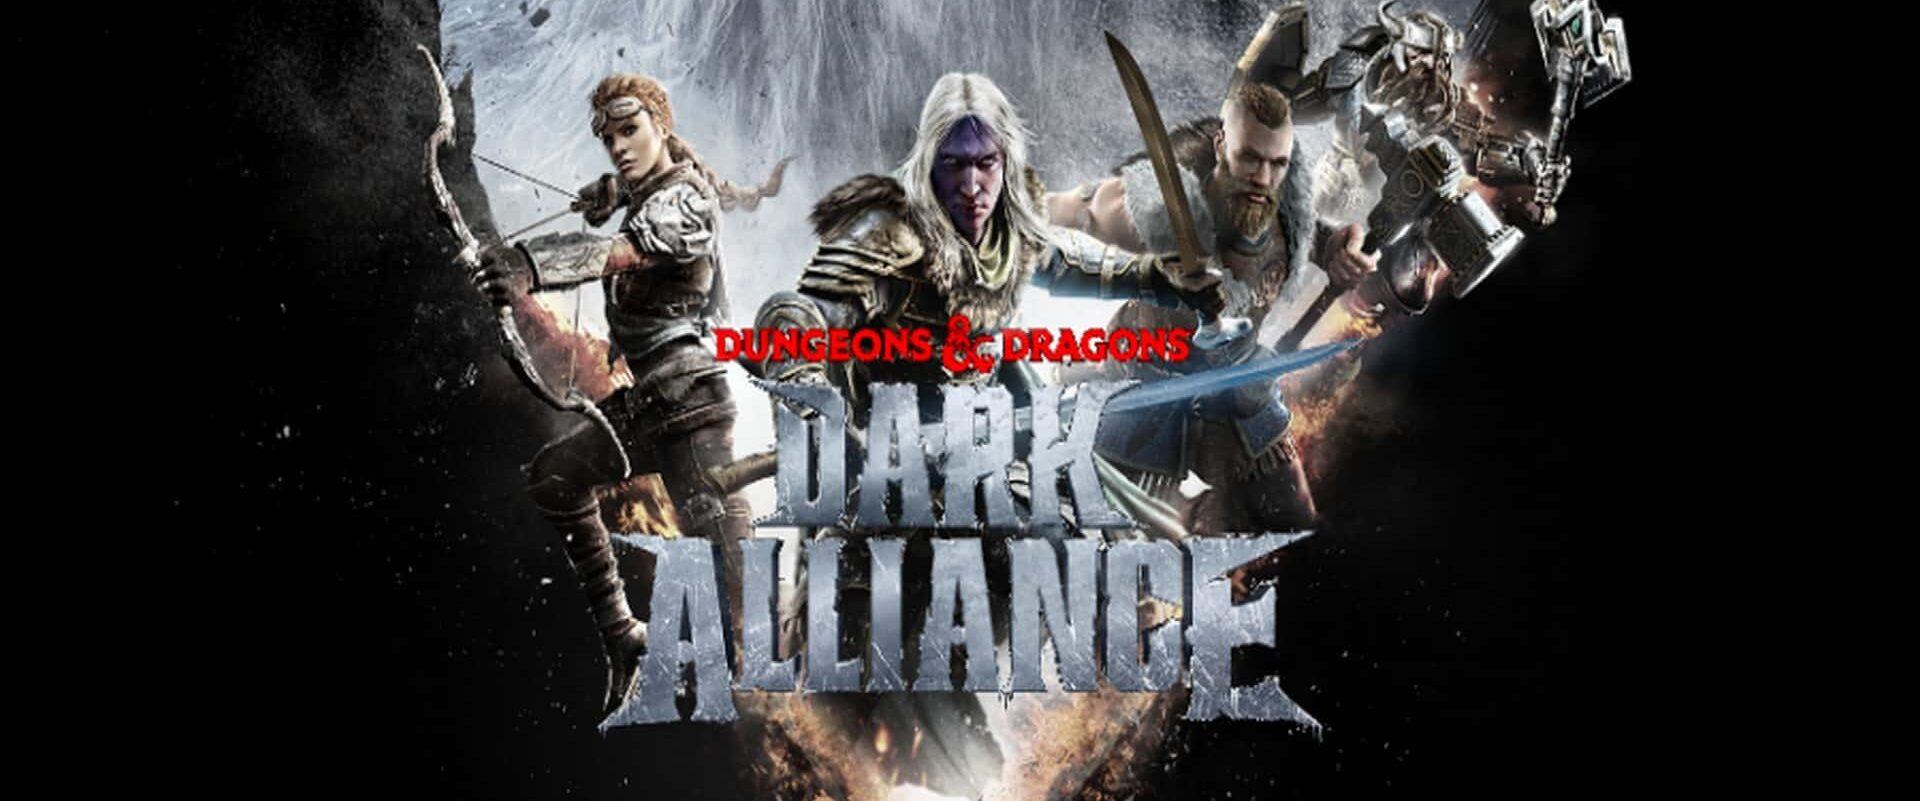 D&D Dark Alliance